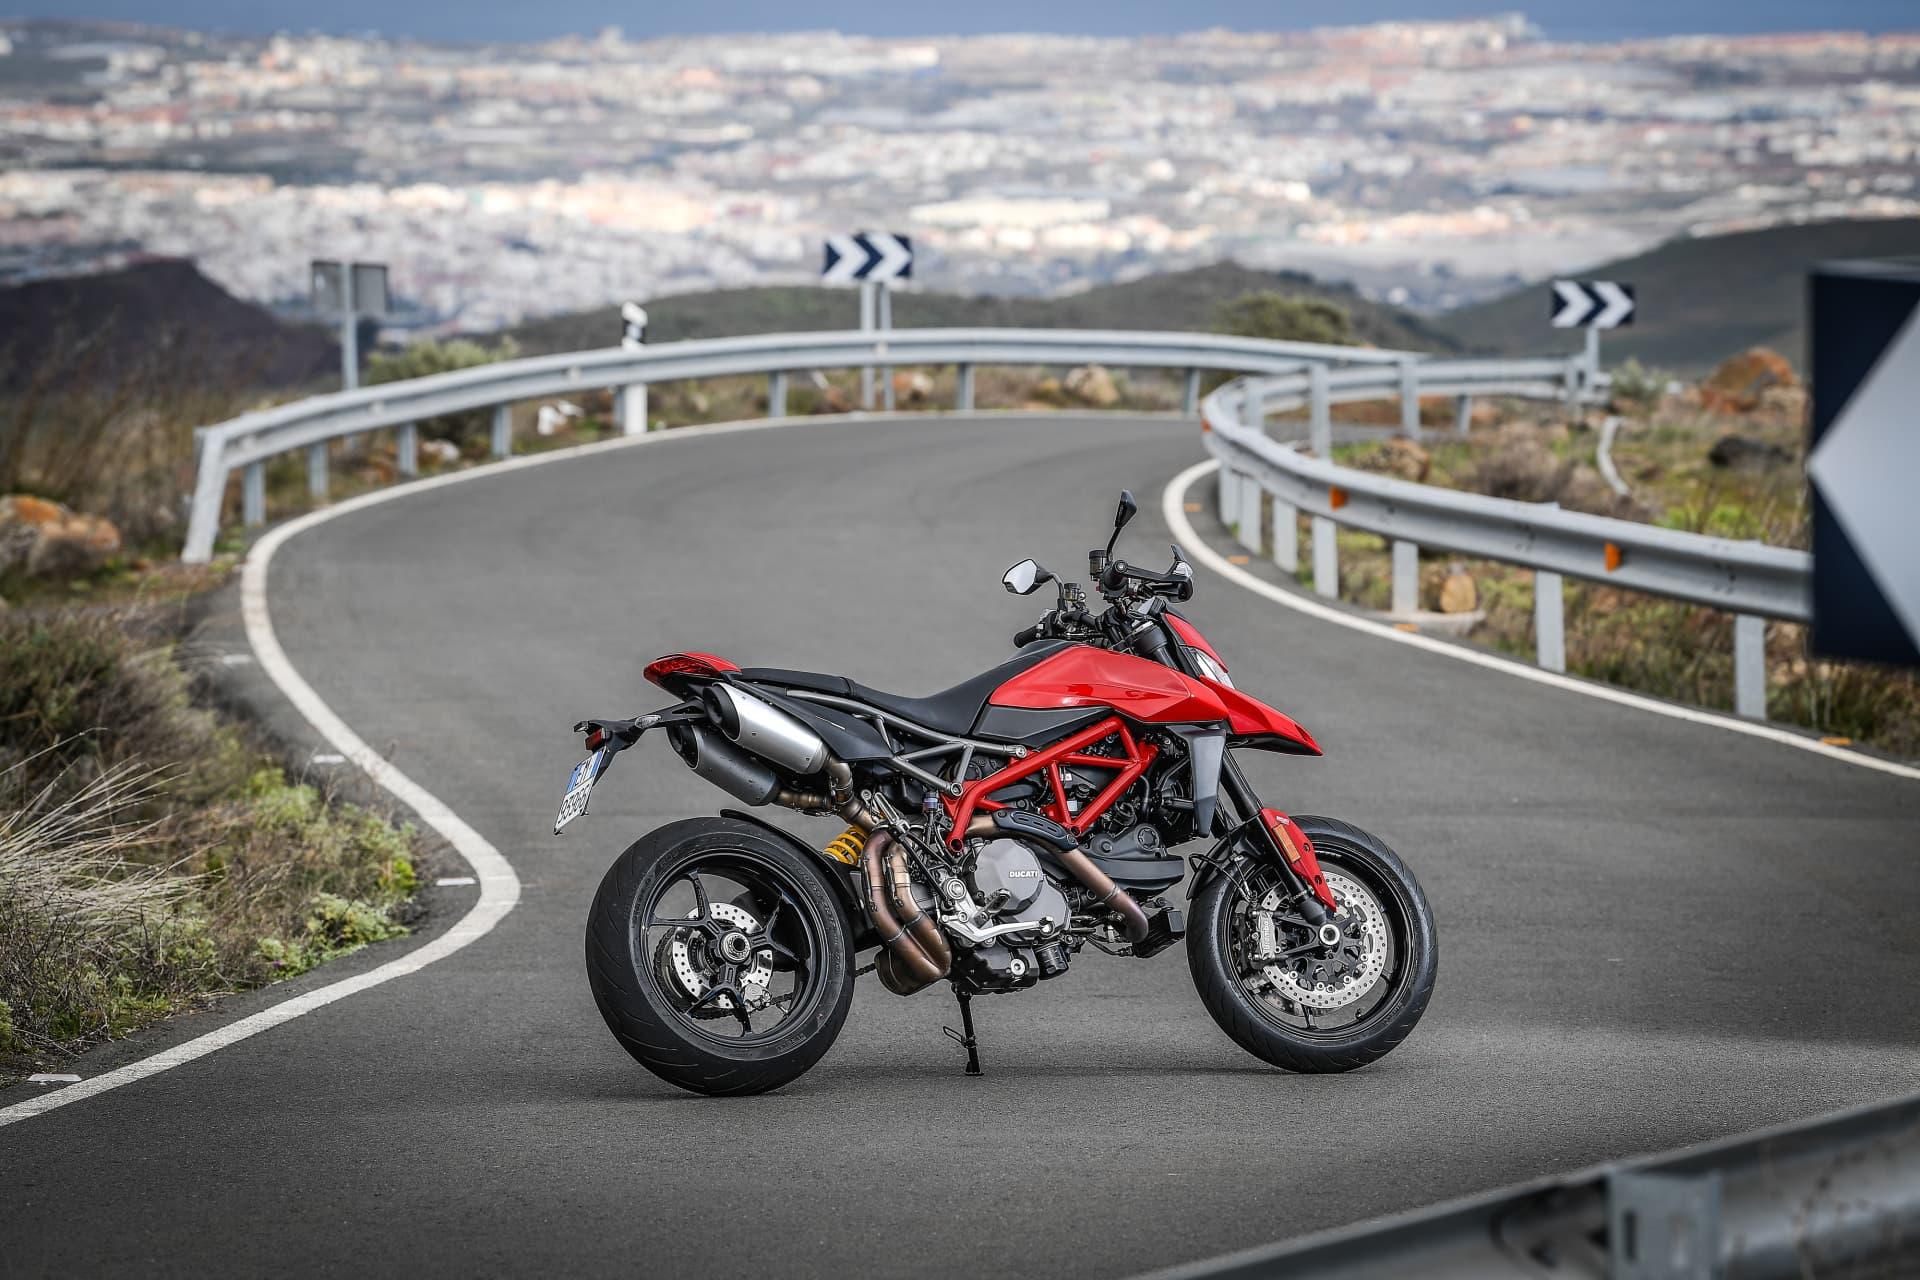 Ducati Hypermotard 950 Static 02 Uc70264 Mid